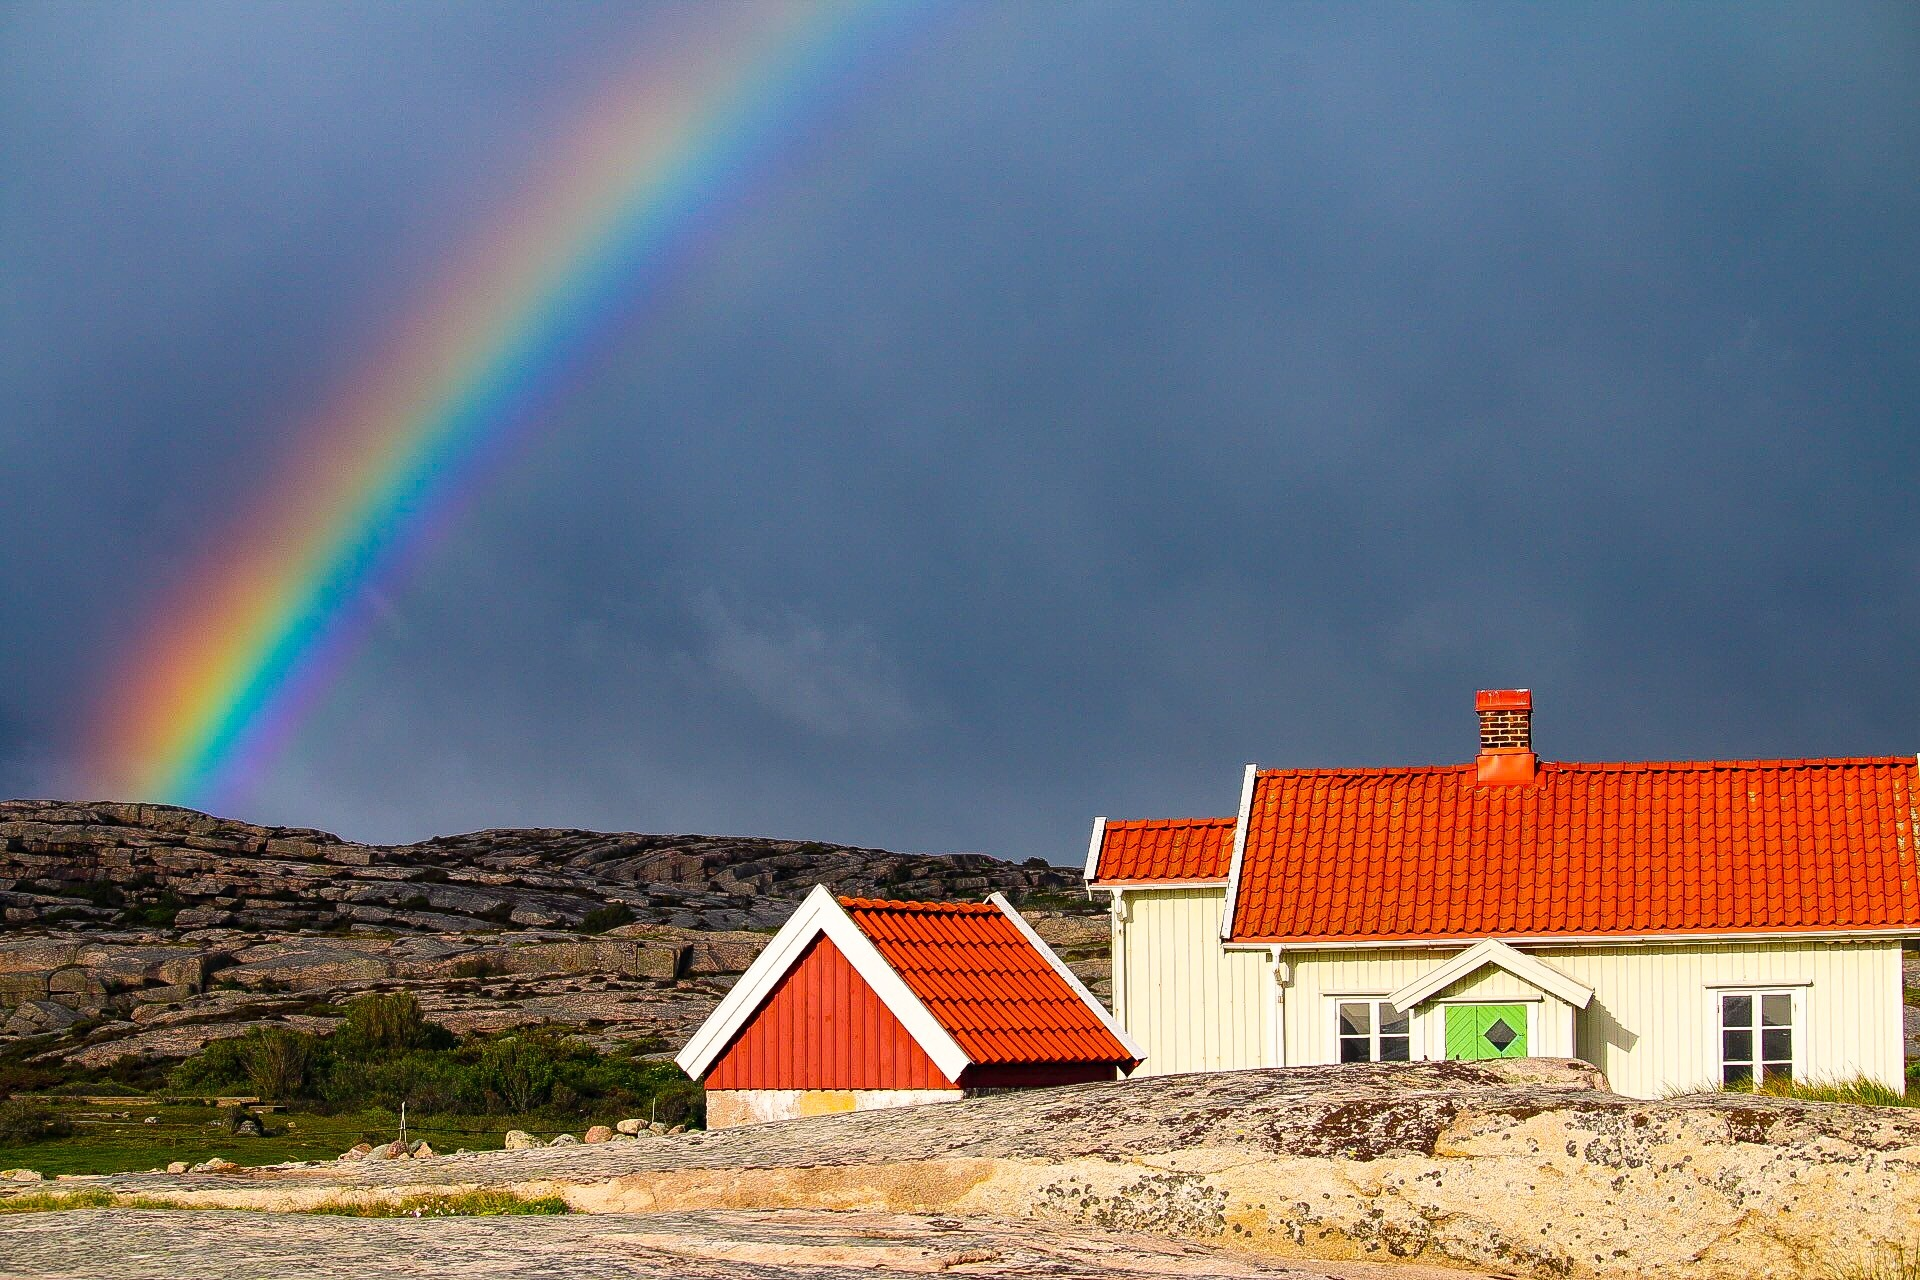 Rainbow by Ingstina